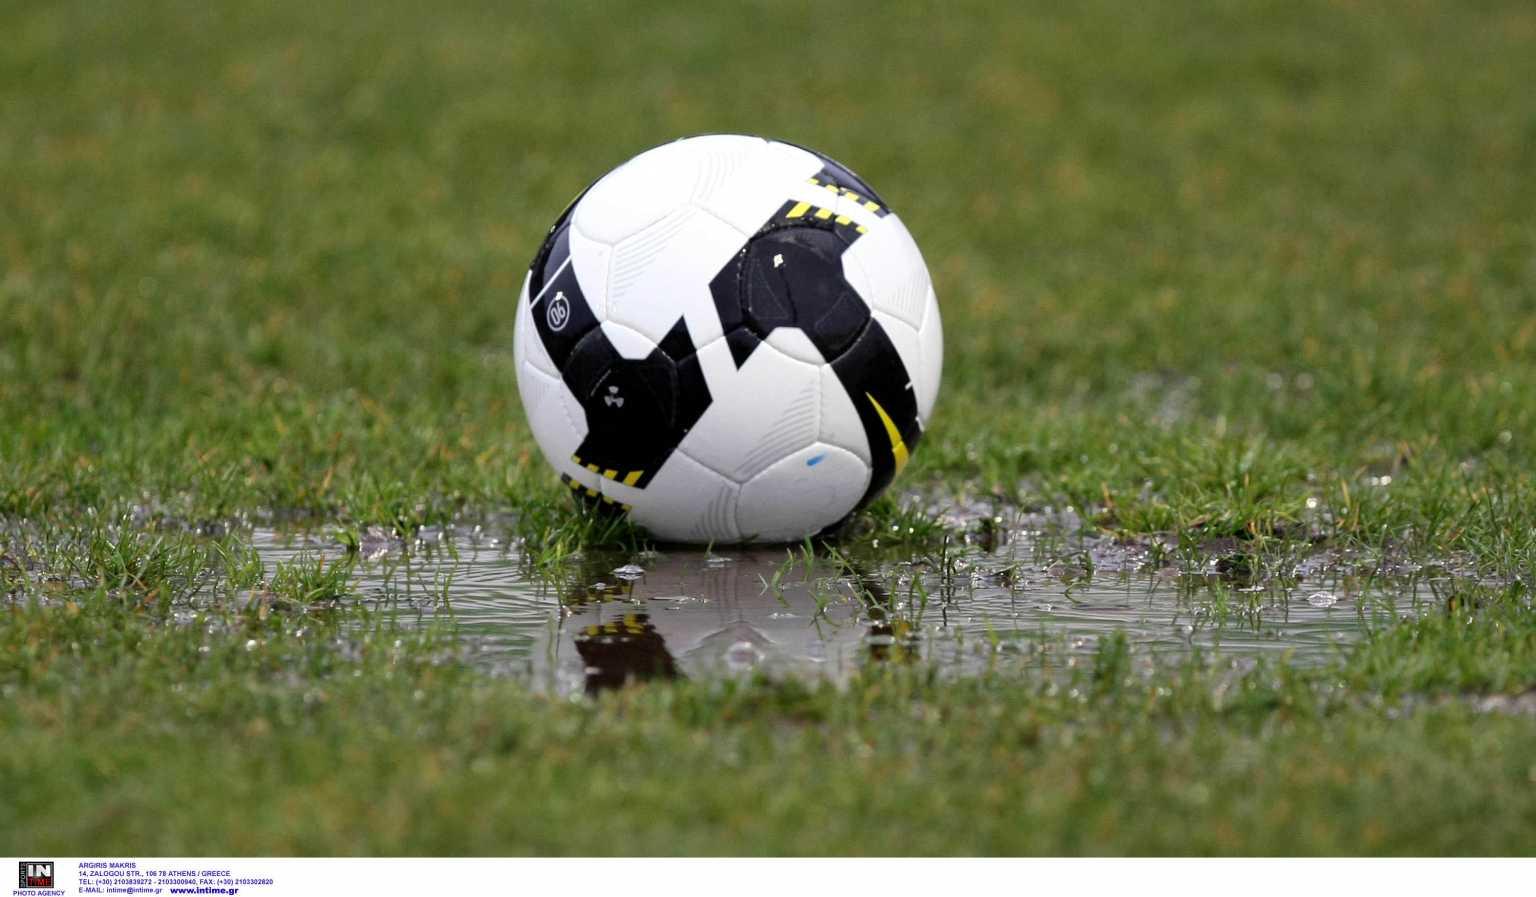 Superleague 2 και Football League κάθετα αρνητικές στην αναδιάρθρωση